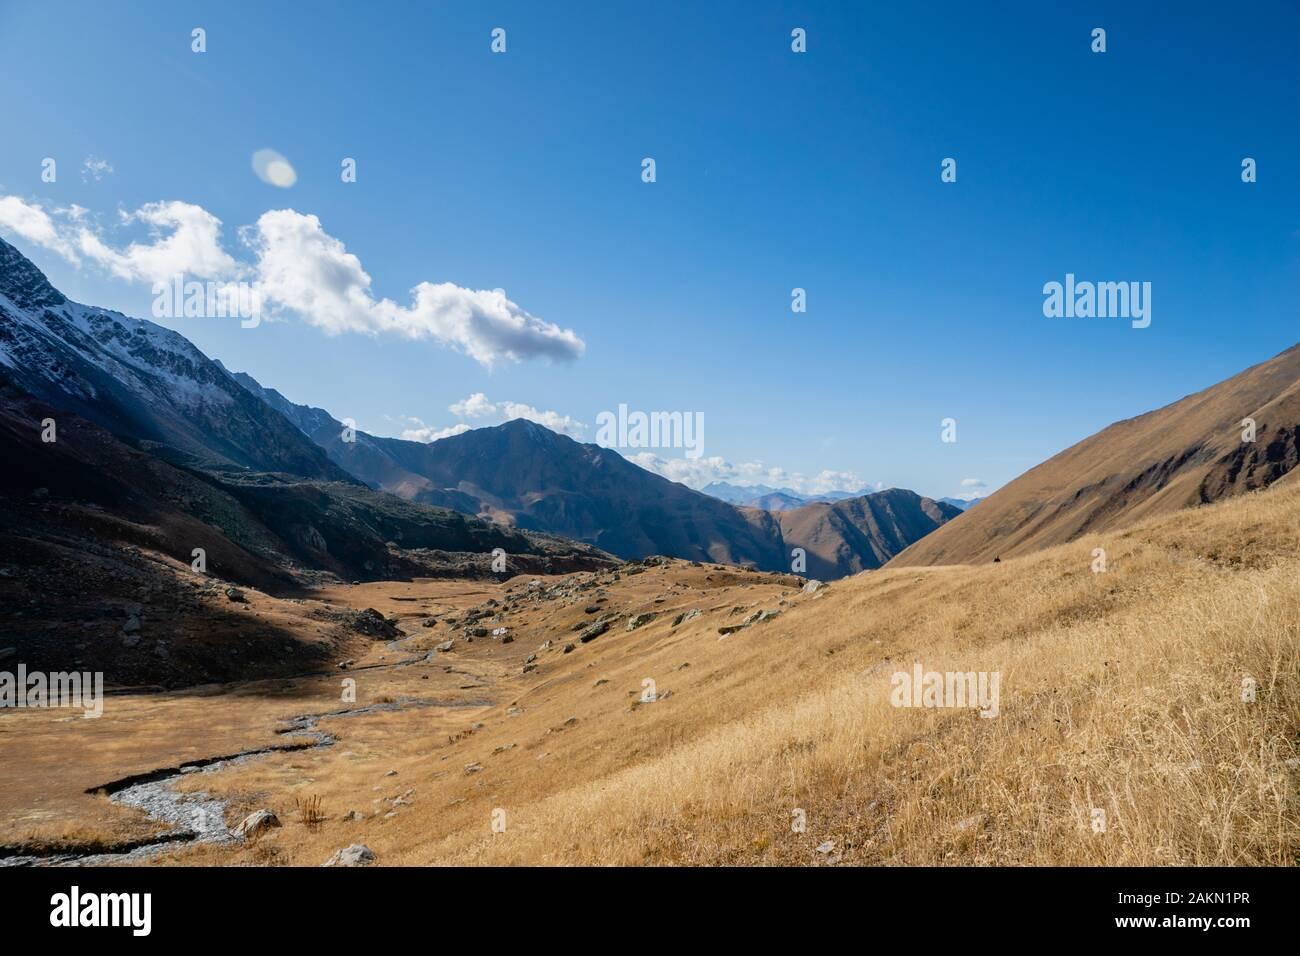 Juta trekking path landscape with river and mountains in sunny autumn day -  popular trekking  in the Caucasus mountains, Kazbegi region, Georgia. Stock Photo